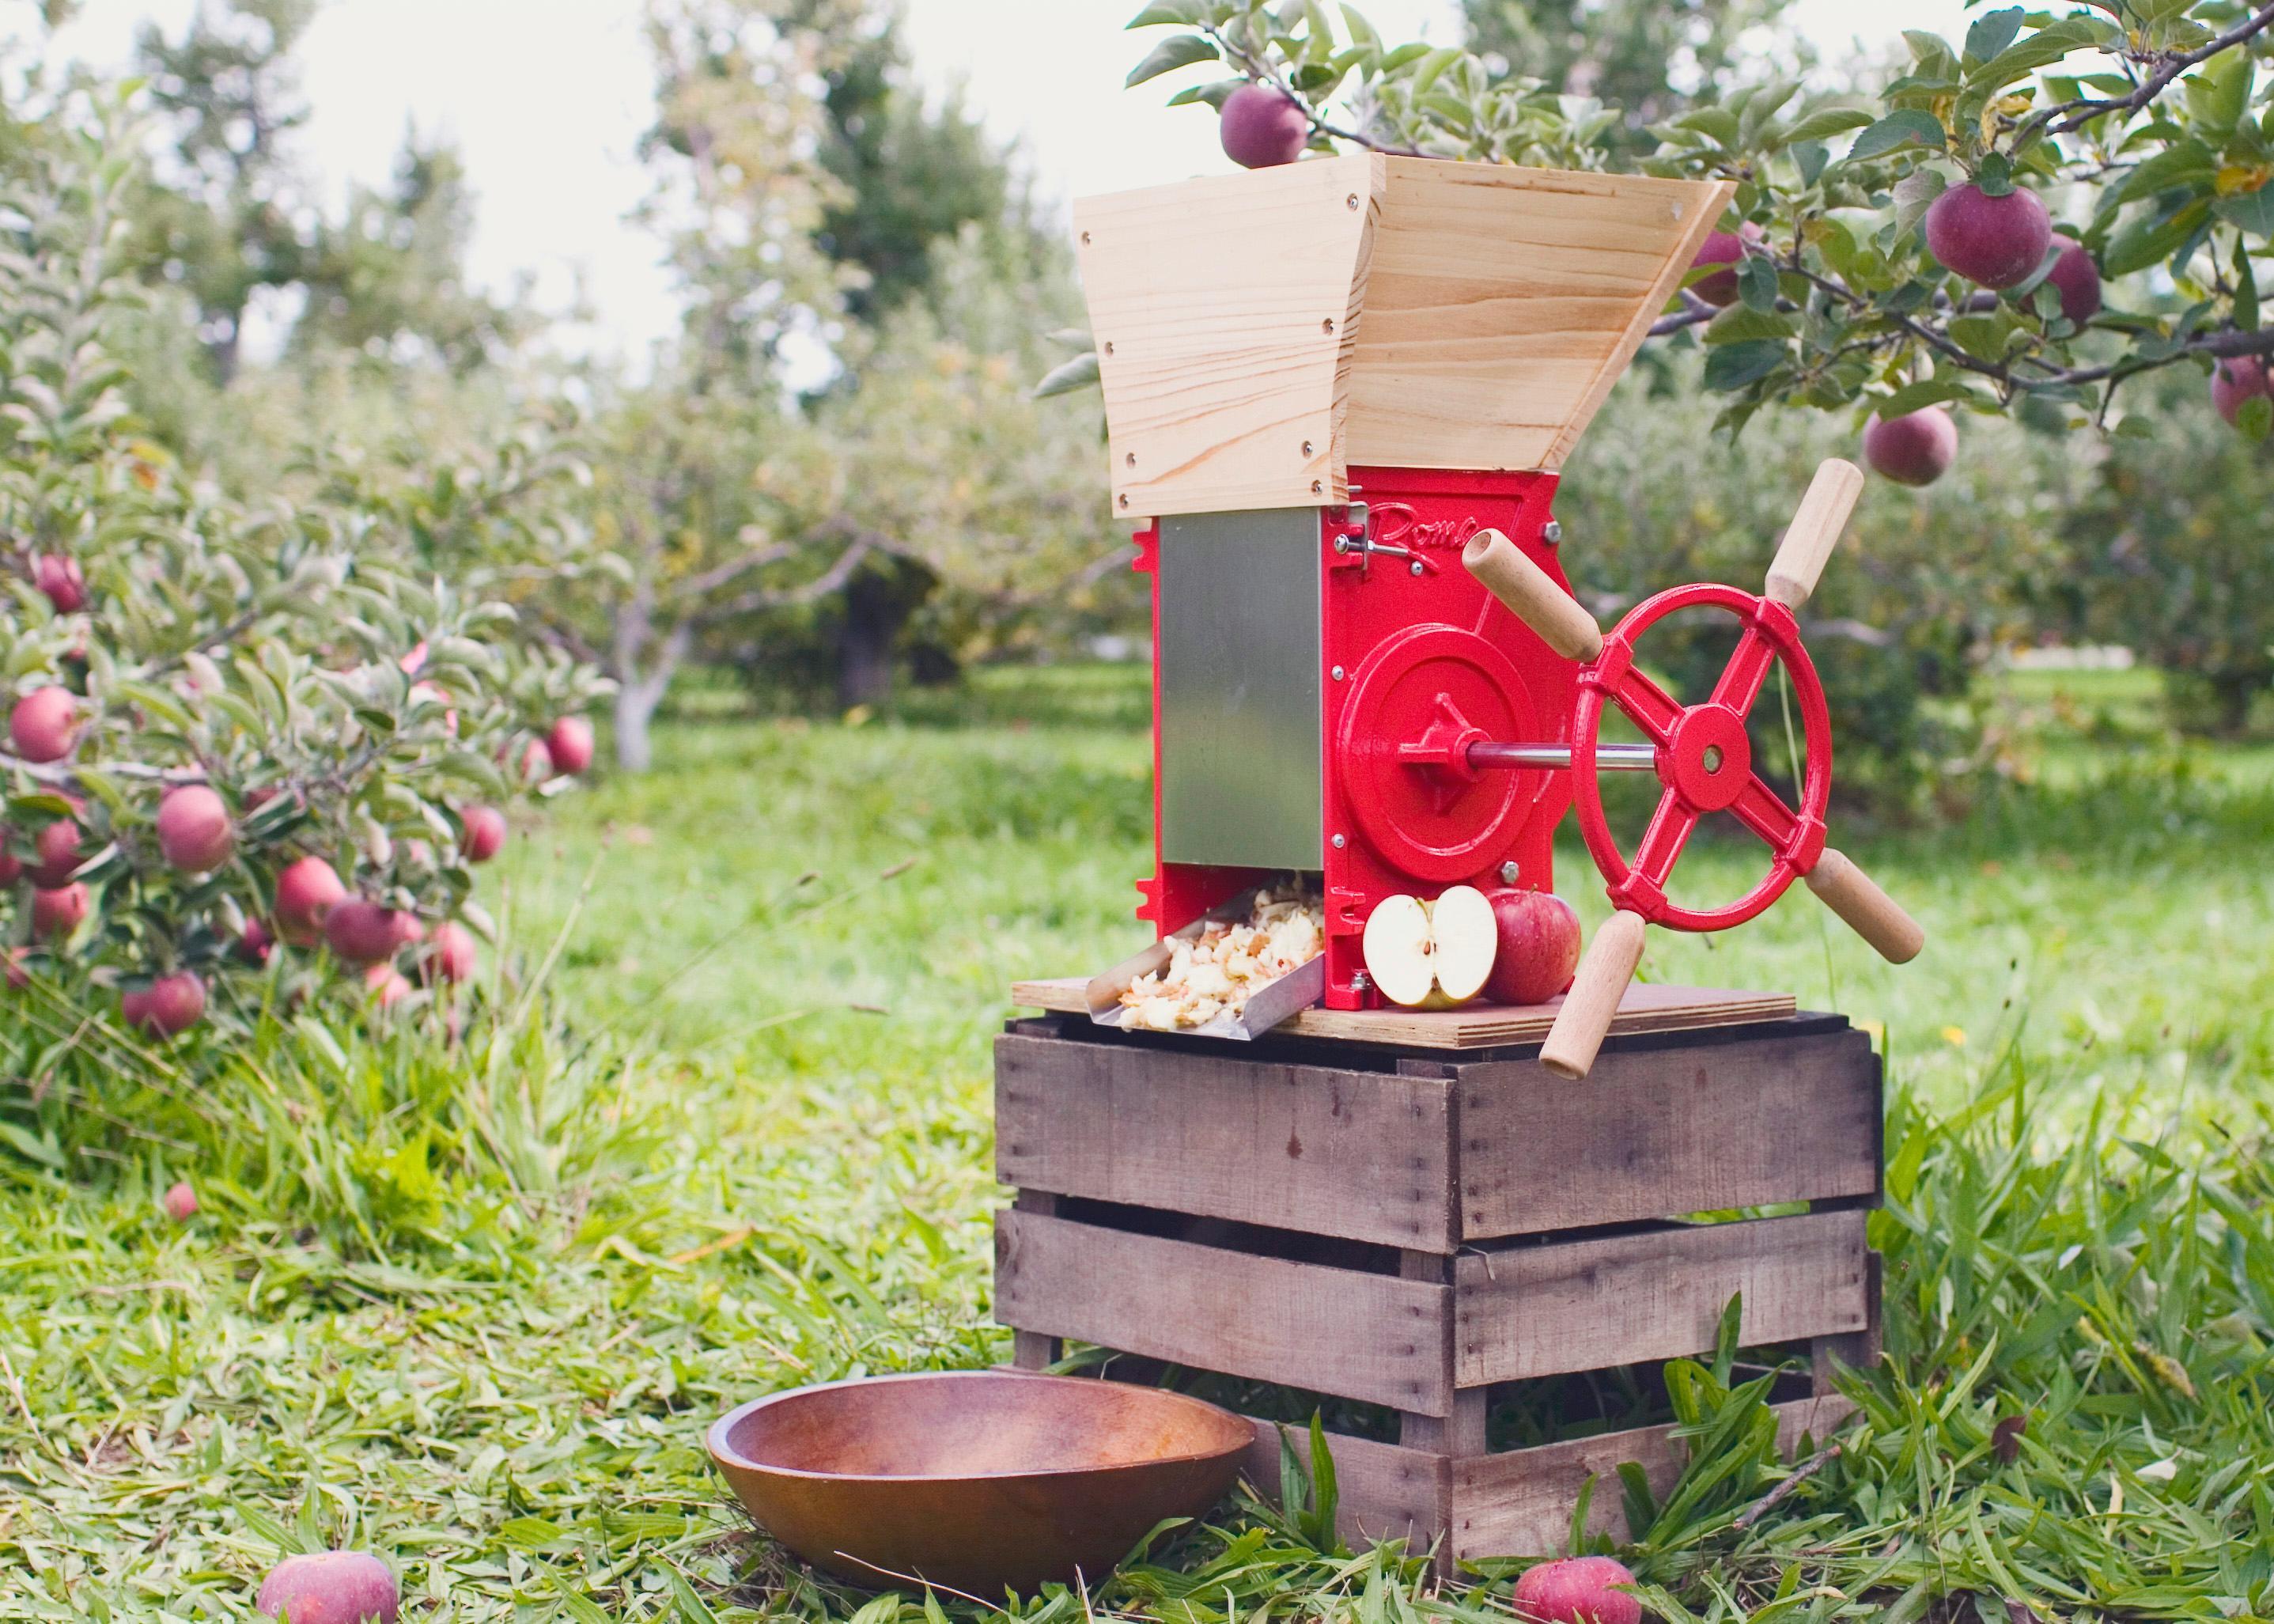 Fruit crusher grape apple crusher grinder for grape apple fruit - View Larger